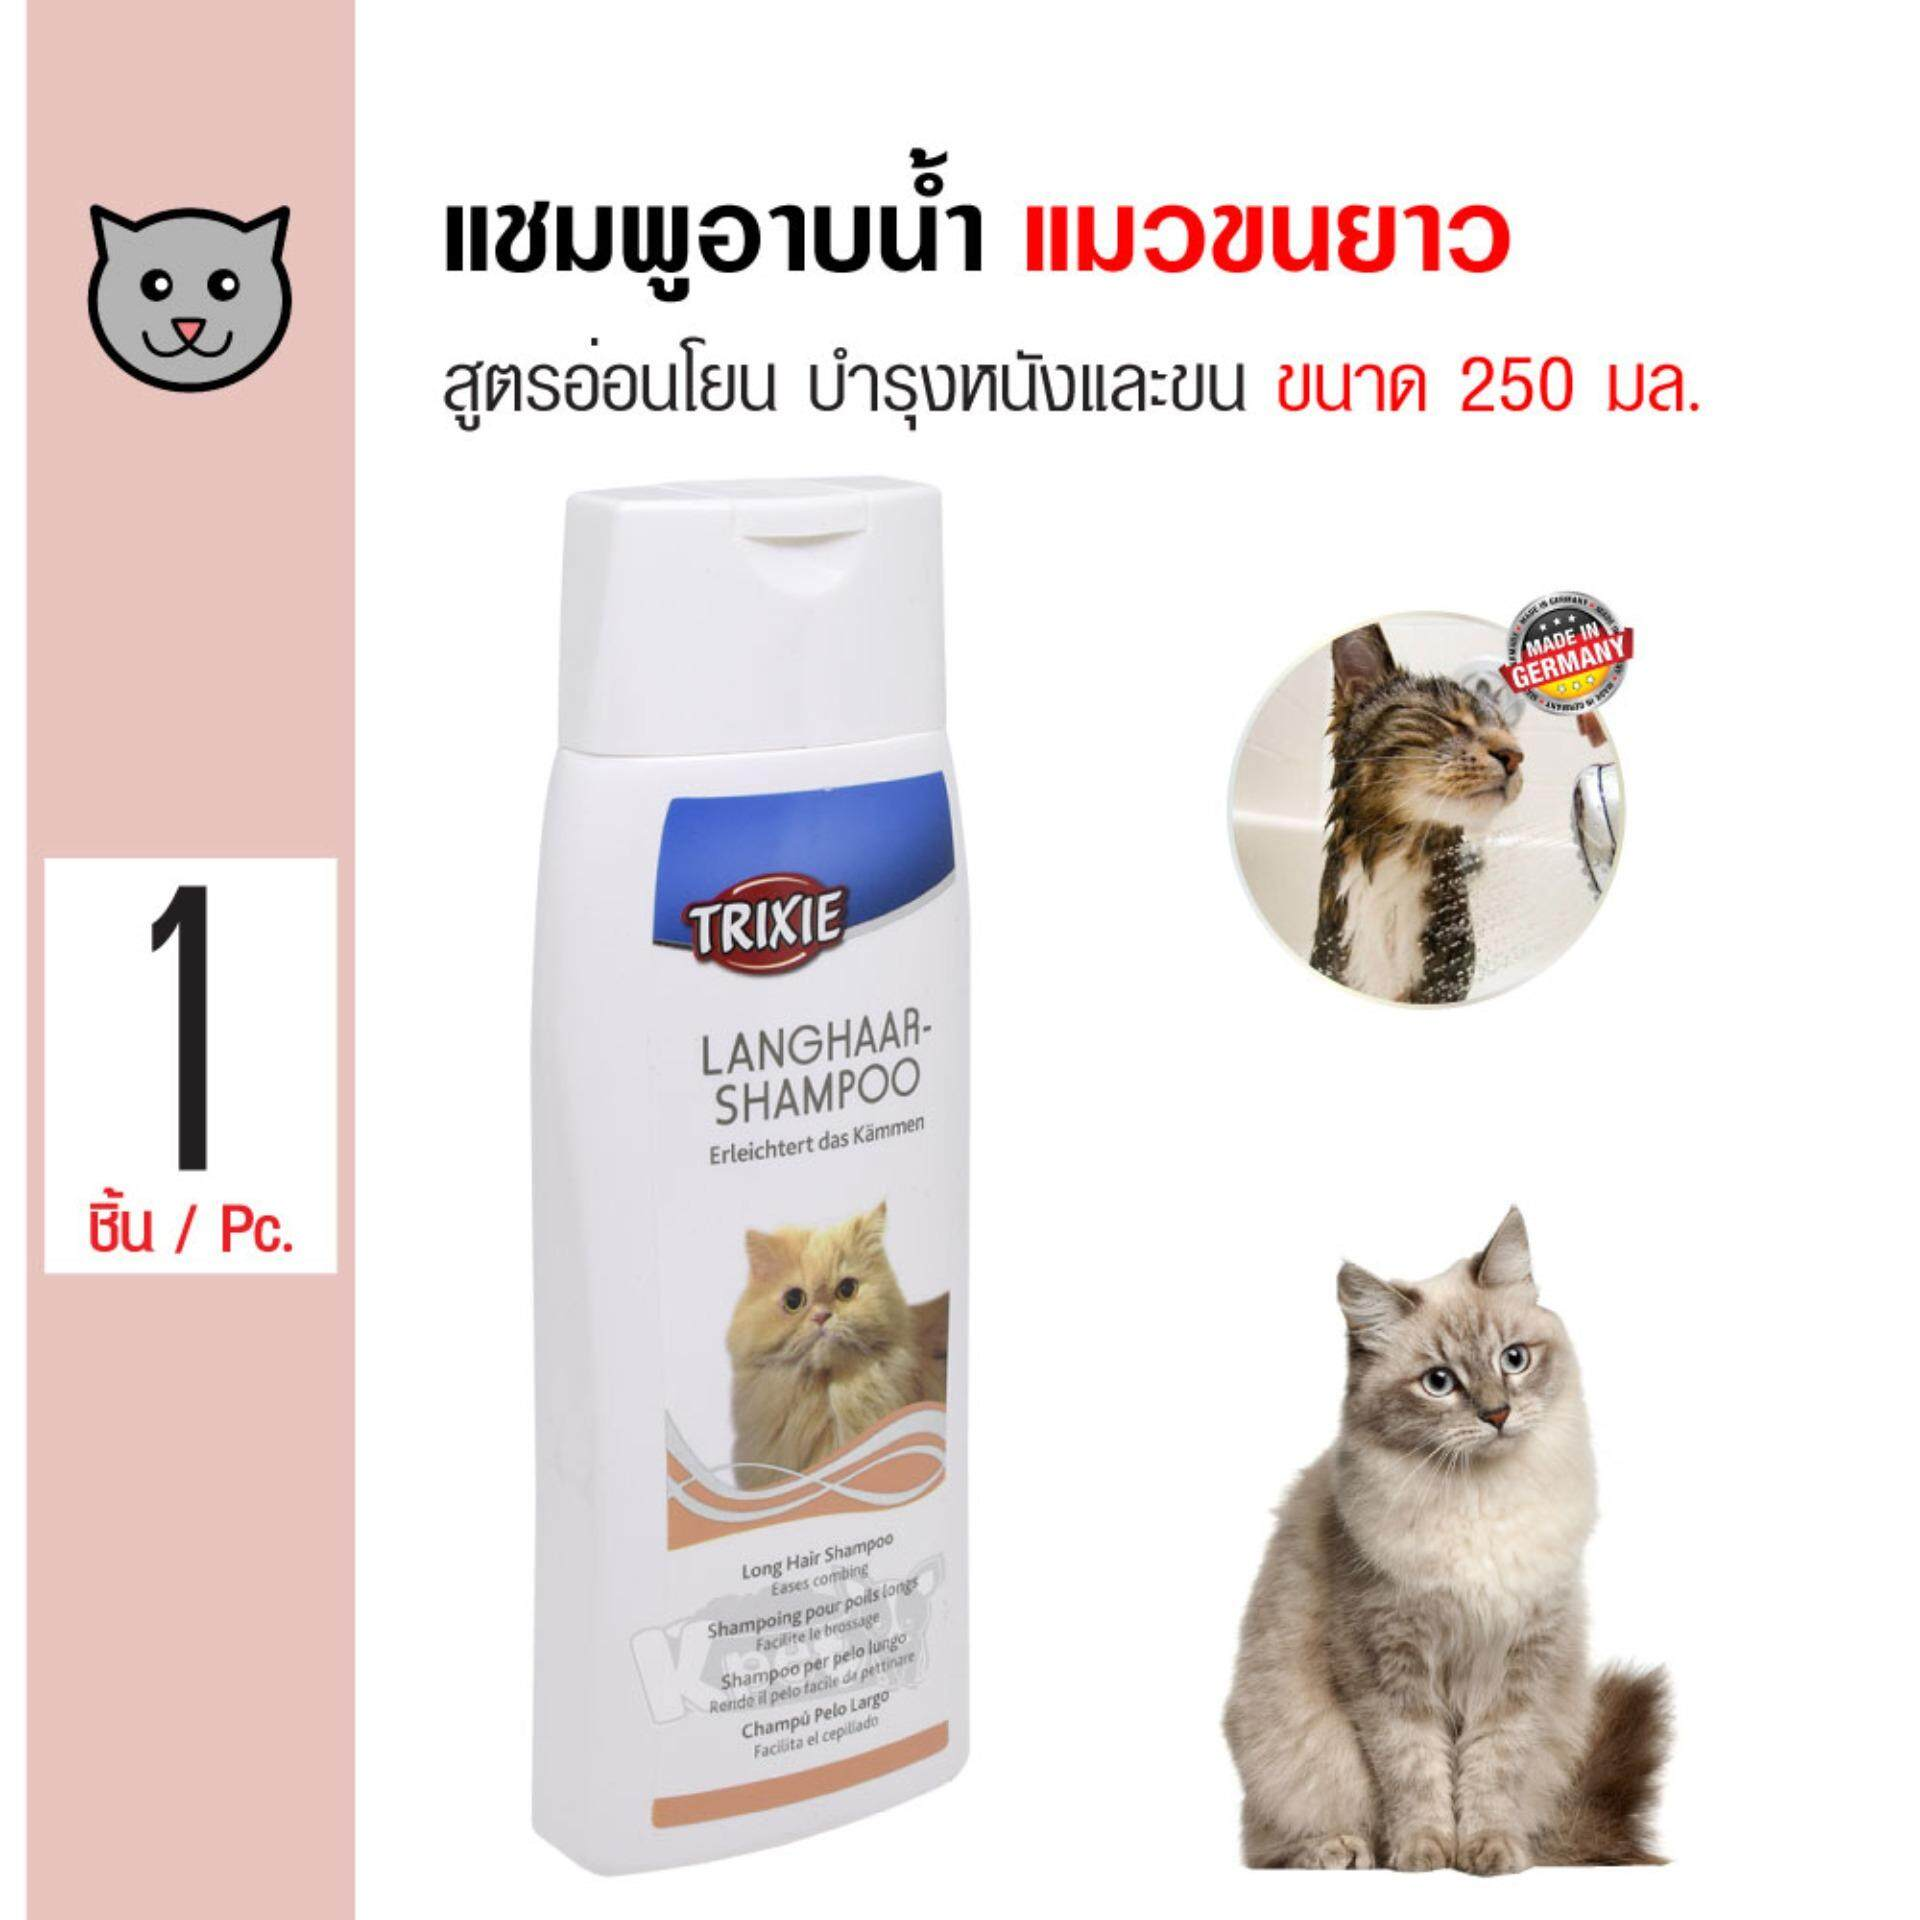 Trixie Cat Shampoo แชมพูแมว สูตรแมวขนยาว อ่อนโยน บำรุงผิวหนังและขน สำหรับแมวขนยาว (250 มล./ขวด) By Kpet.